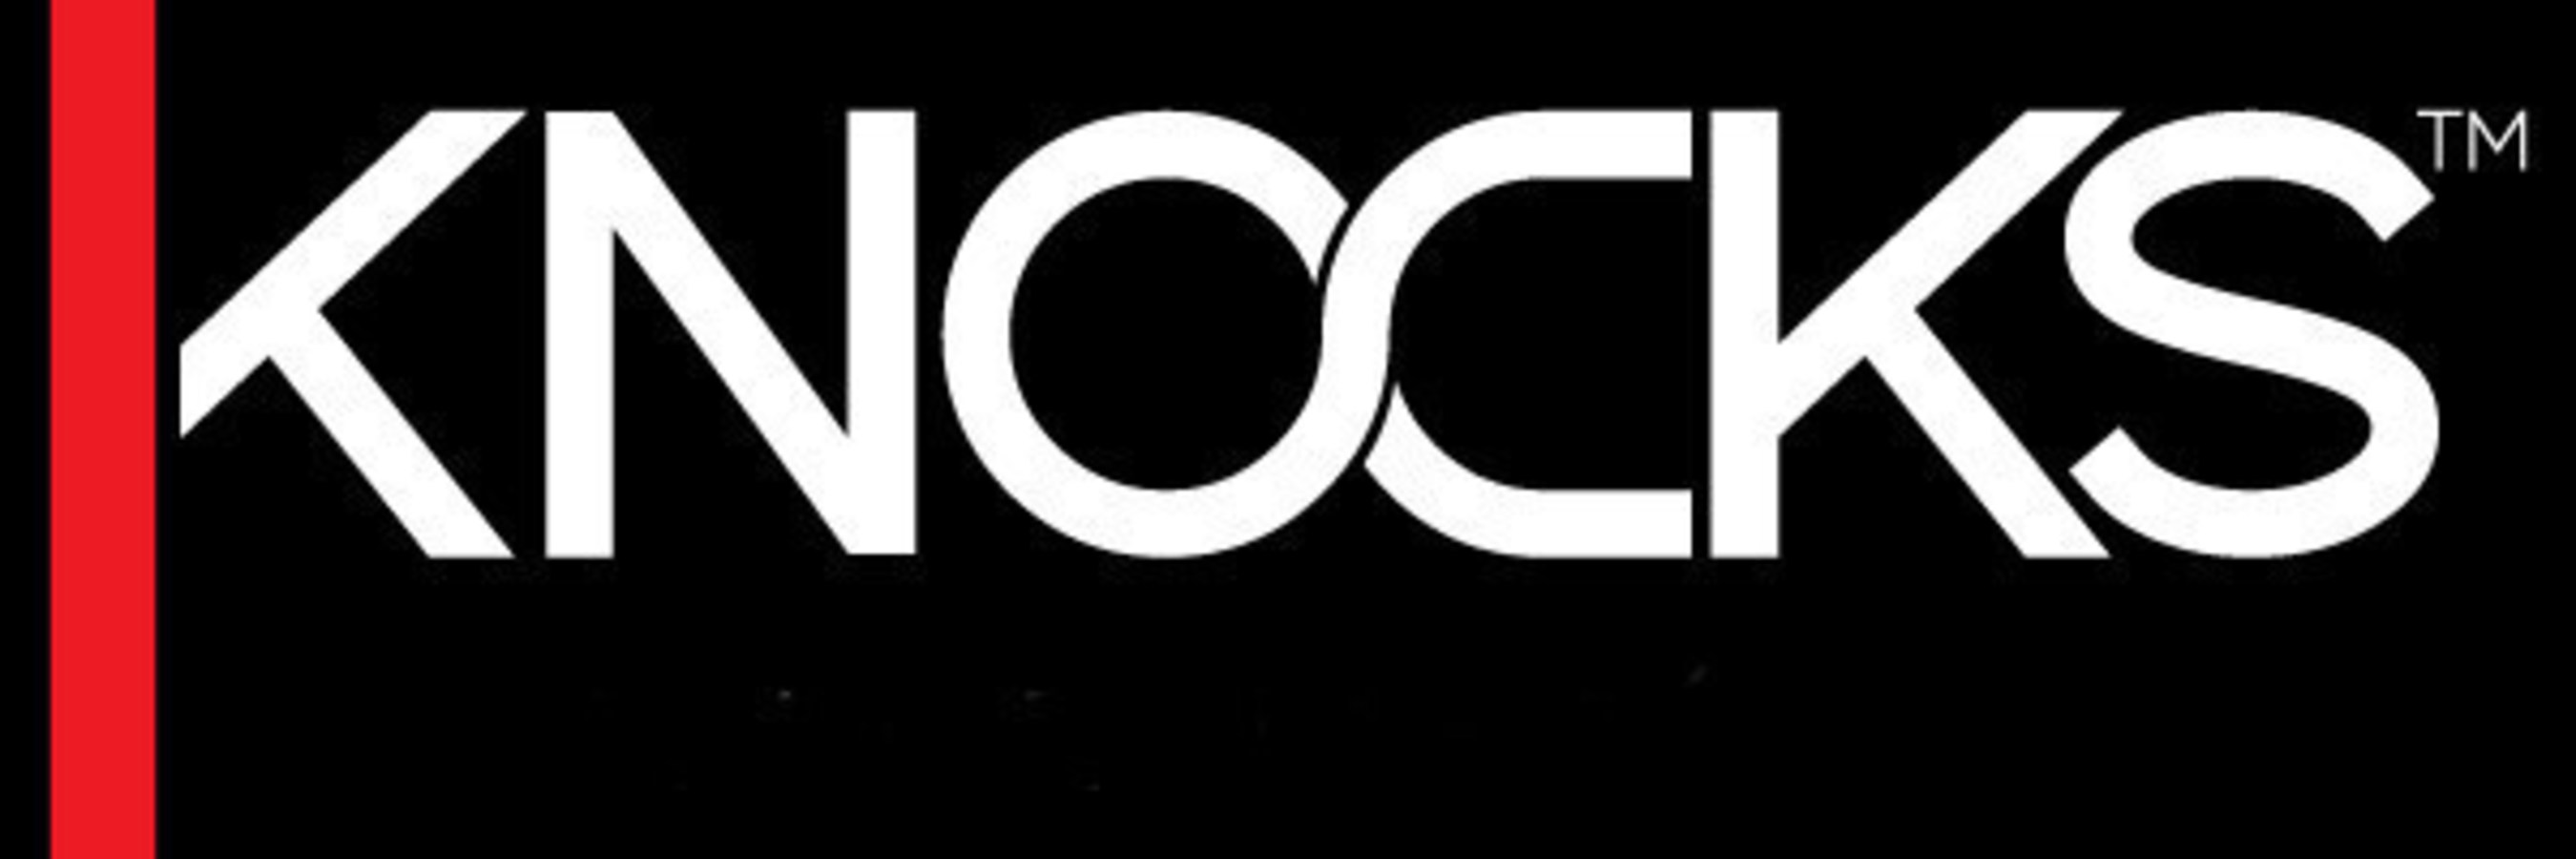 KNOCKSsocks - www.knockssocks.com